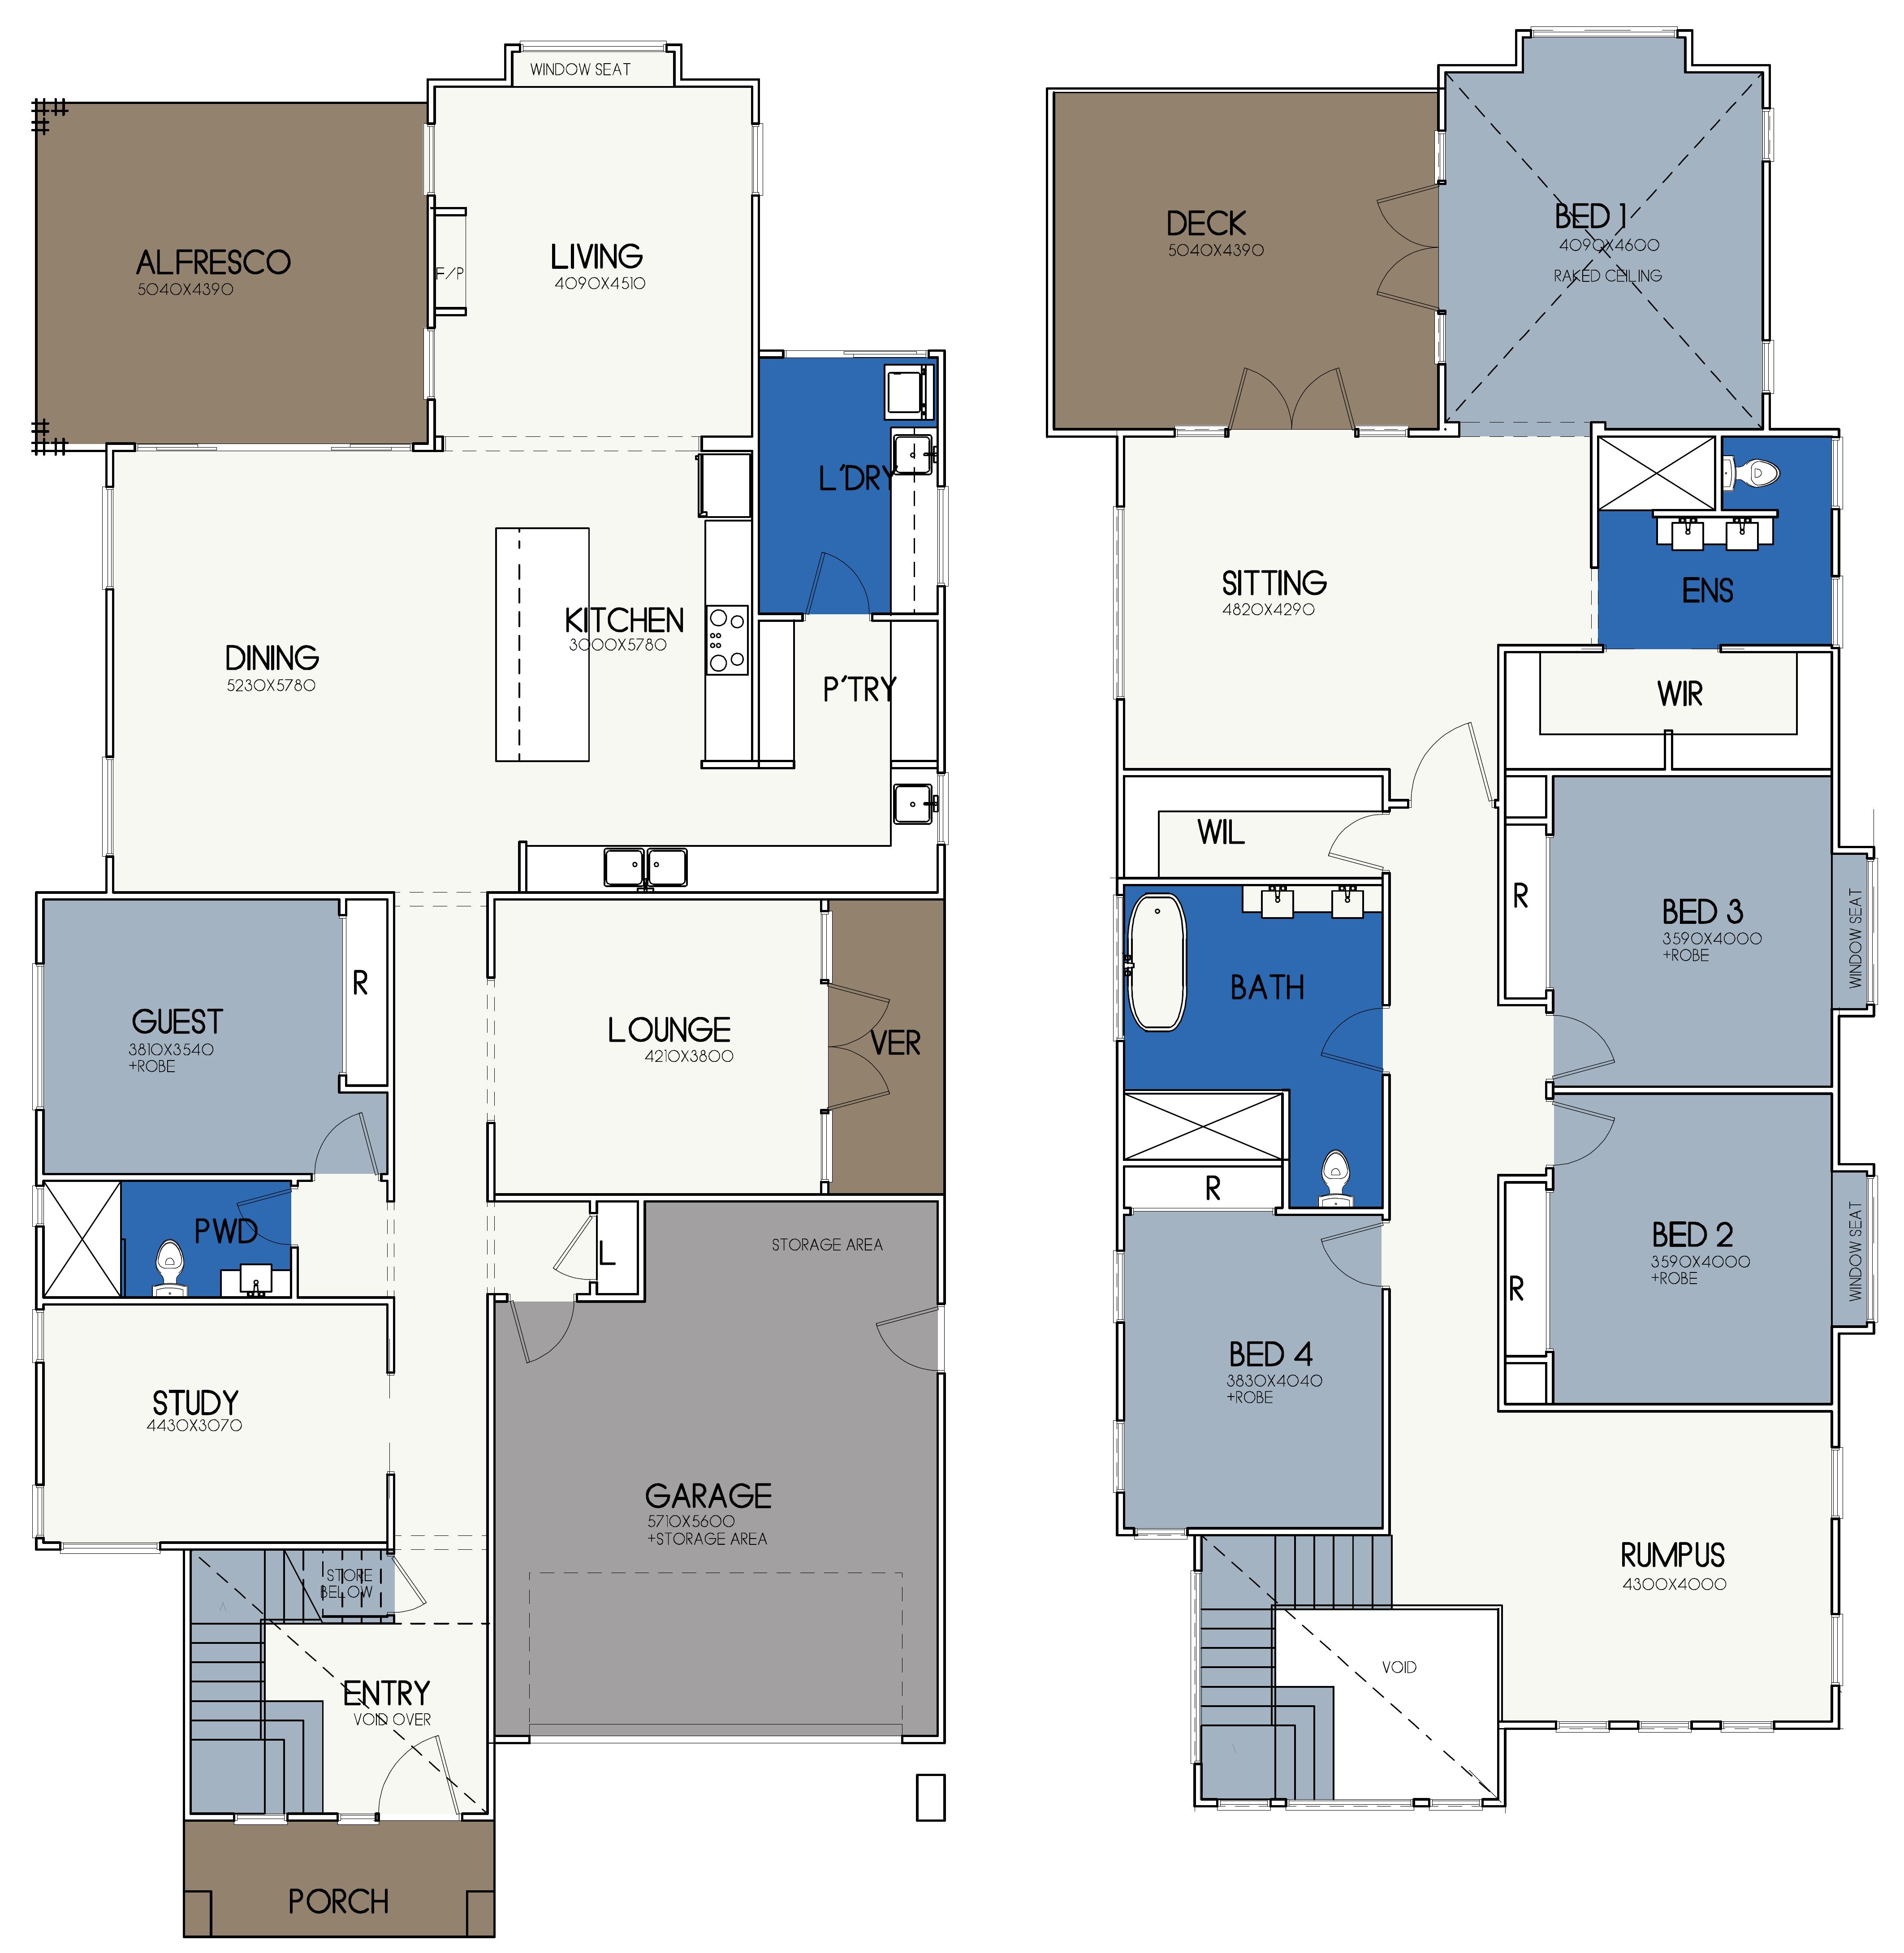 LOT 8 FAIRWAY DRIVE, WILTON – BINGARA GORGE floor plan